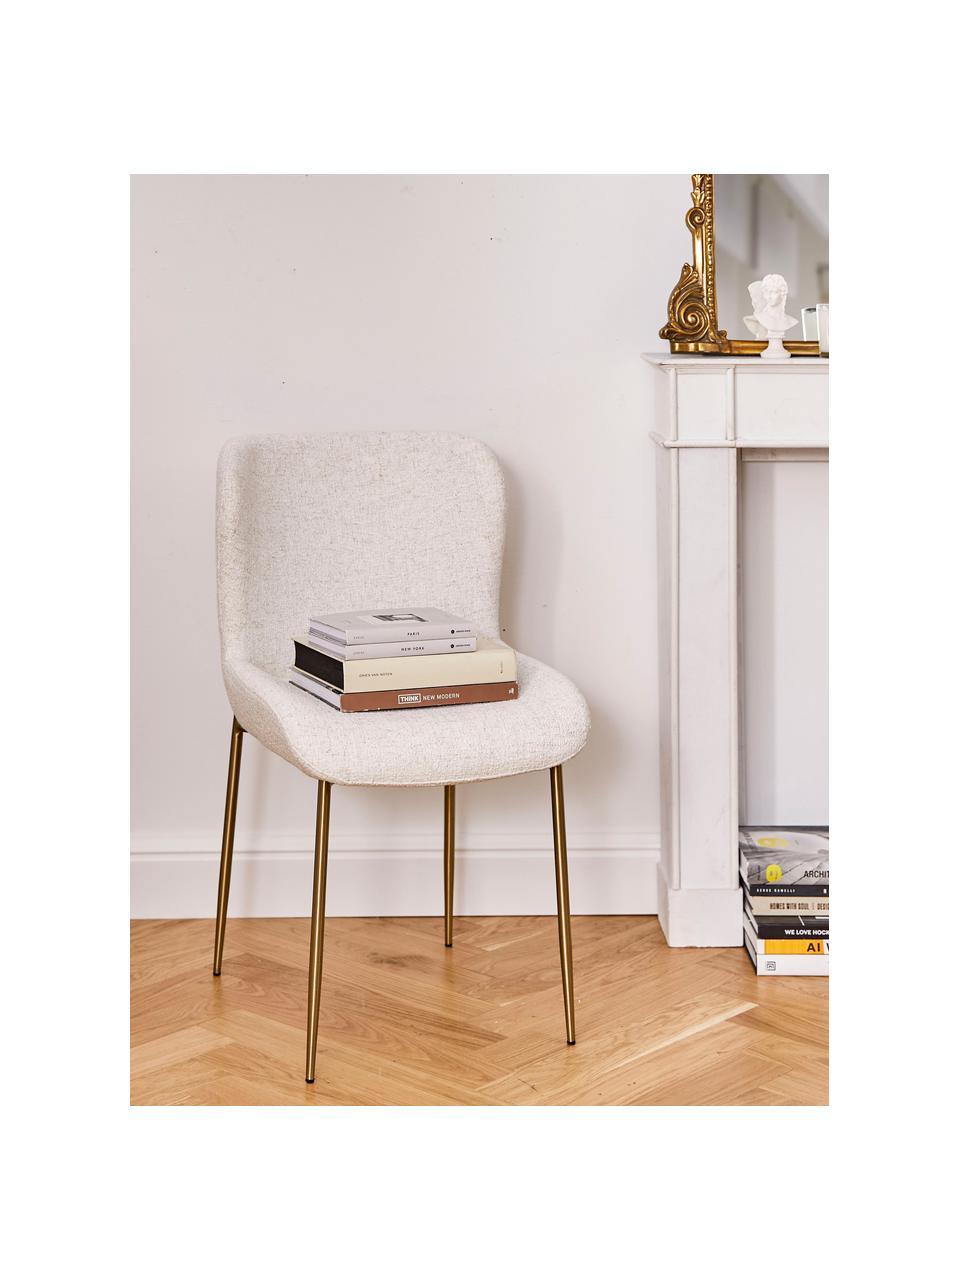 Bouclé-gestoffeerde stoel Tess in crèmewit, Bekleding: 70% polyester, 20% viscos, Poten: gepoedercoat metaal, Bouclé crèmewit, goudkleurig, B 49 x D 64 cm